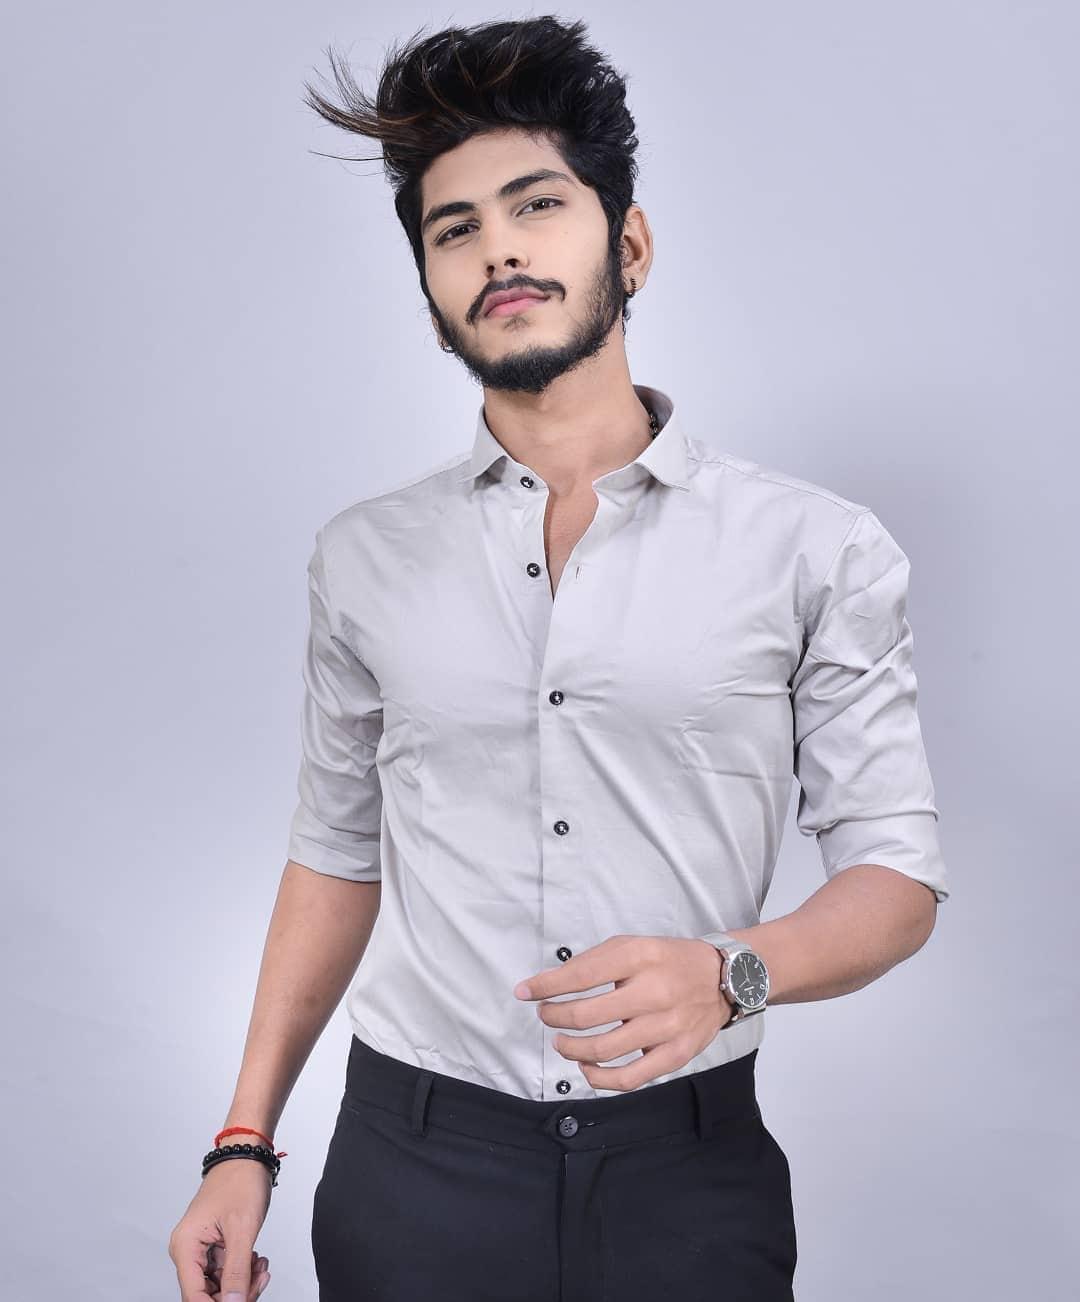 Wearing Steel Grey formal shirt from - @thestyledwellerclothing . . #tsdfam #thestyledwellerclothing #thestyledweller #cotton #cottonshirt #ootd #wiwt #shirt #navyblue #menswear  #mensfashion  #fashion #trend #fashioninfluencer  #fashionblogger  #suratinfluencer  #suratblogger  #indianblogger  #lifestyleblogger  #surat #india